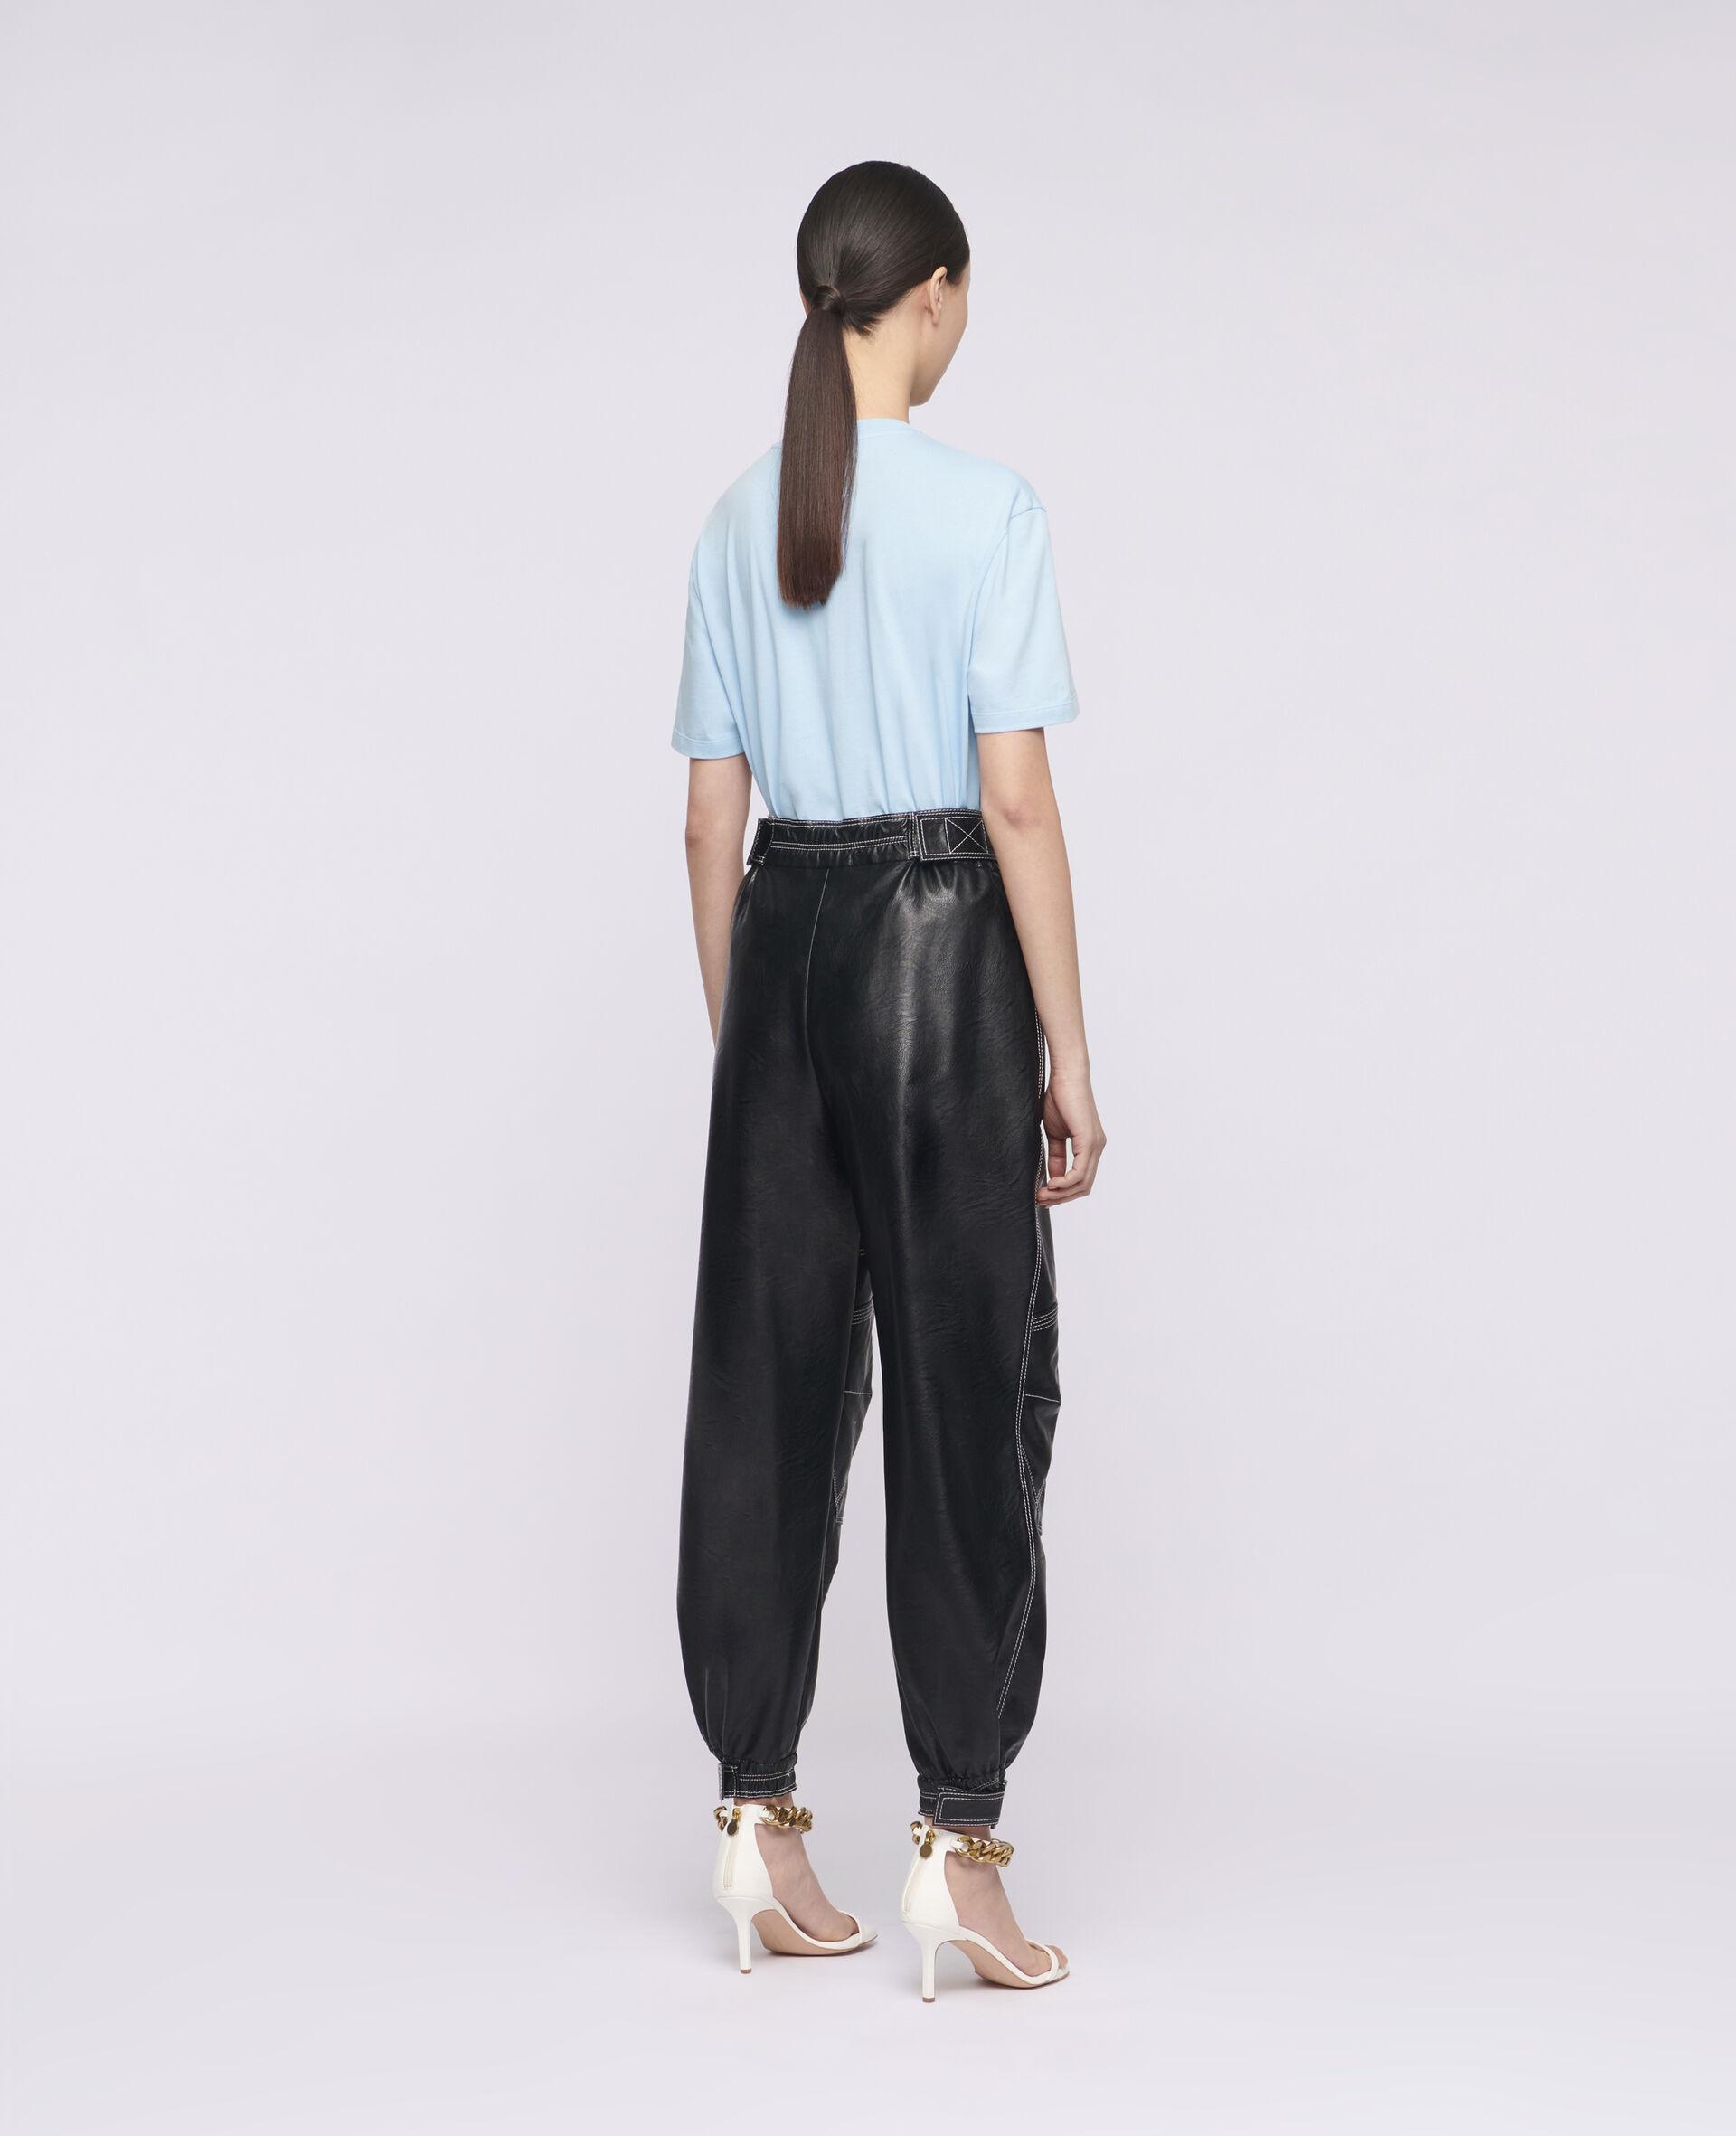 Stella McCartney 2021 徽标 T 恤-蓝色-large image number 2